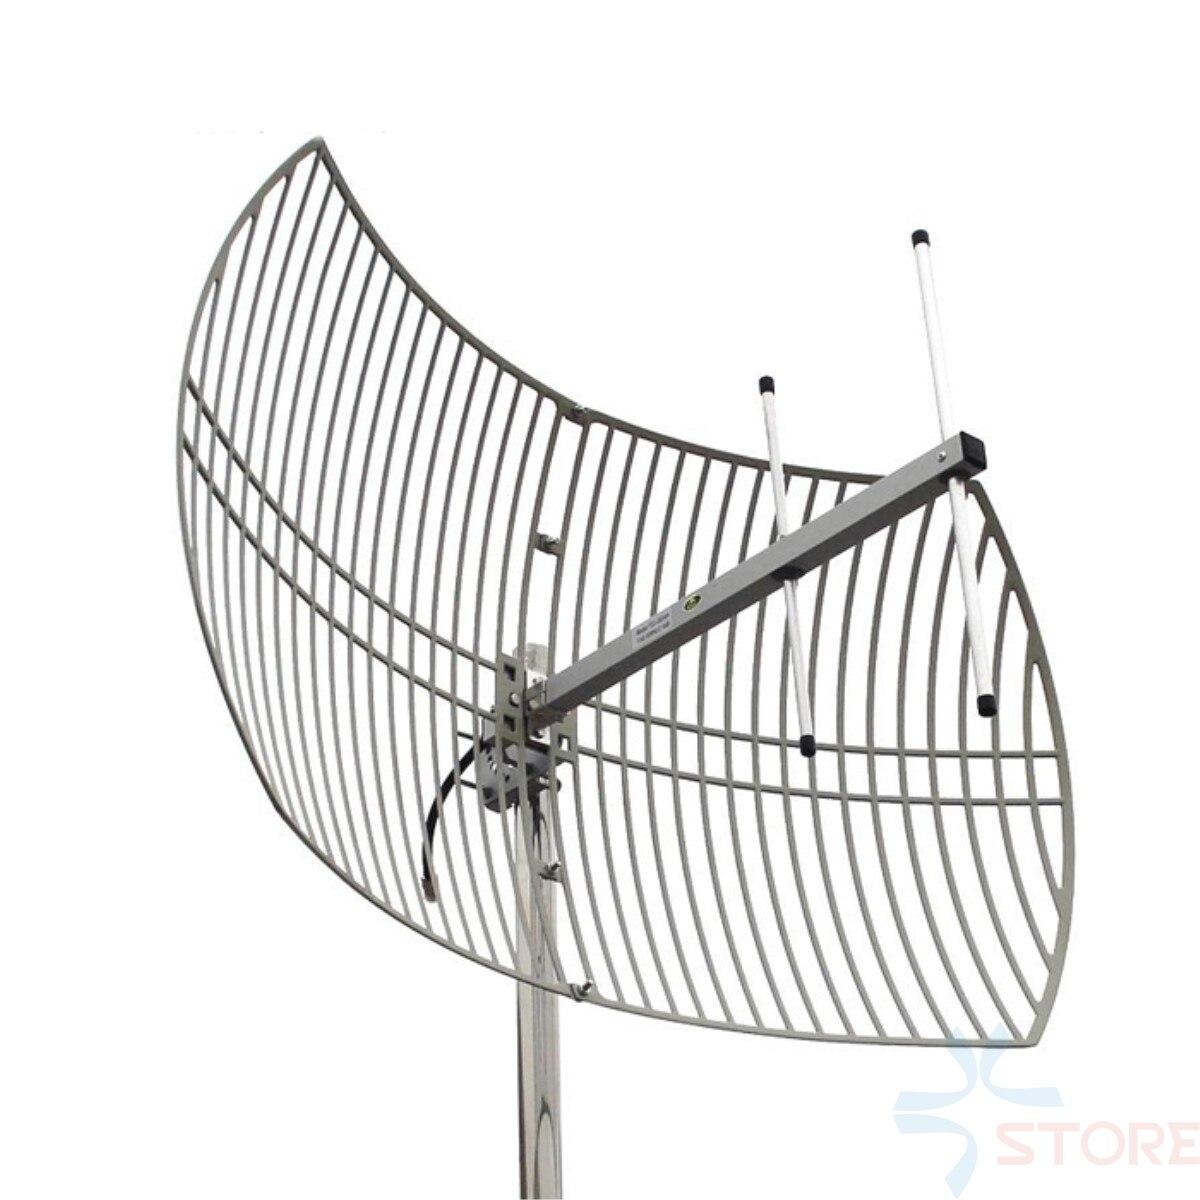 1.2G 1.2Ghz 15dBi High Gain Directional Parabolic Grid